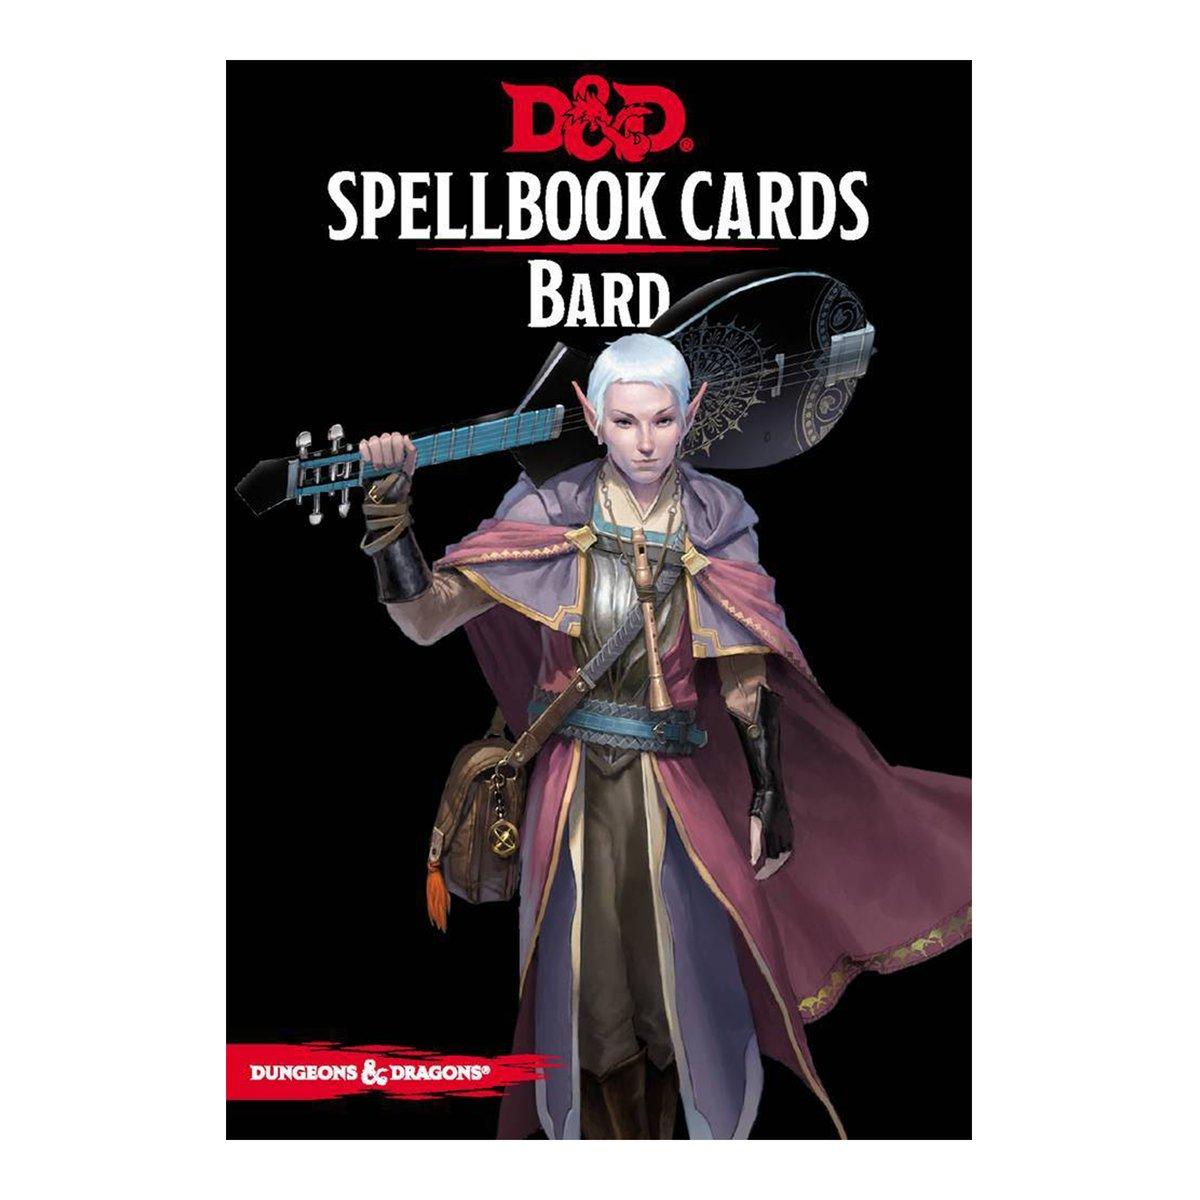 D & D Spellbook Cards - Bard